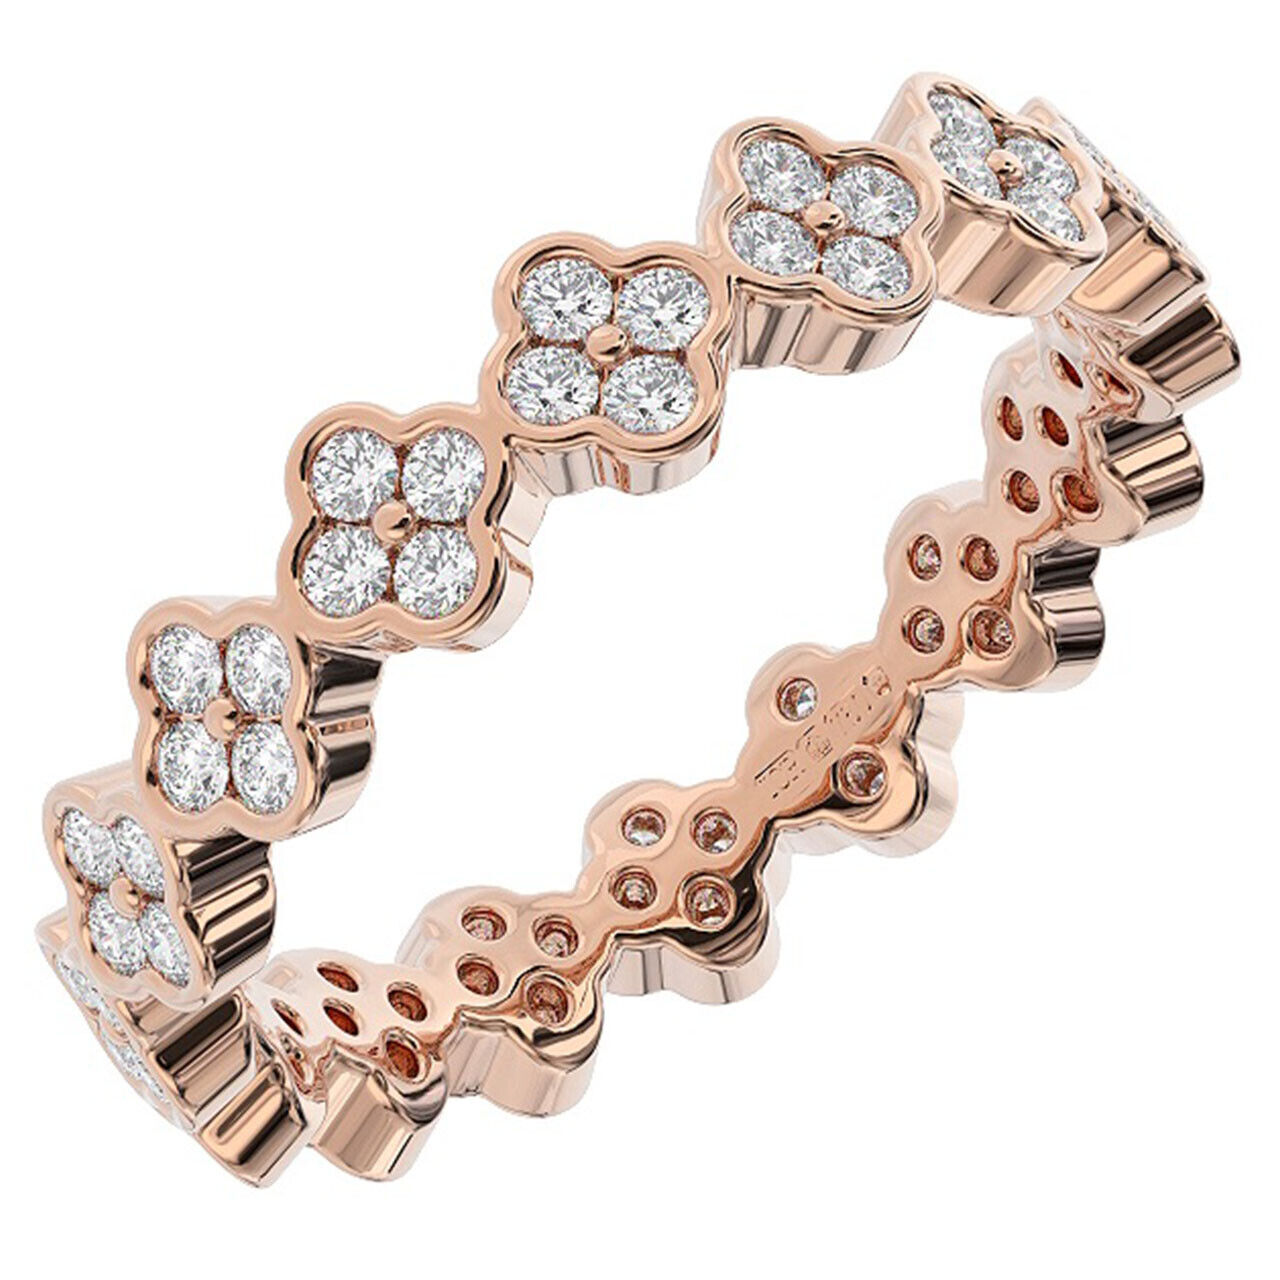 0.75 Carat Round Brilliant Cut Diamonds Full Eternity Ring in 9K pink gold